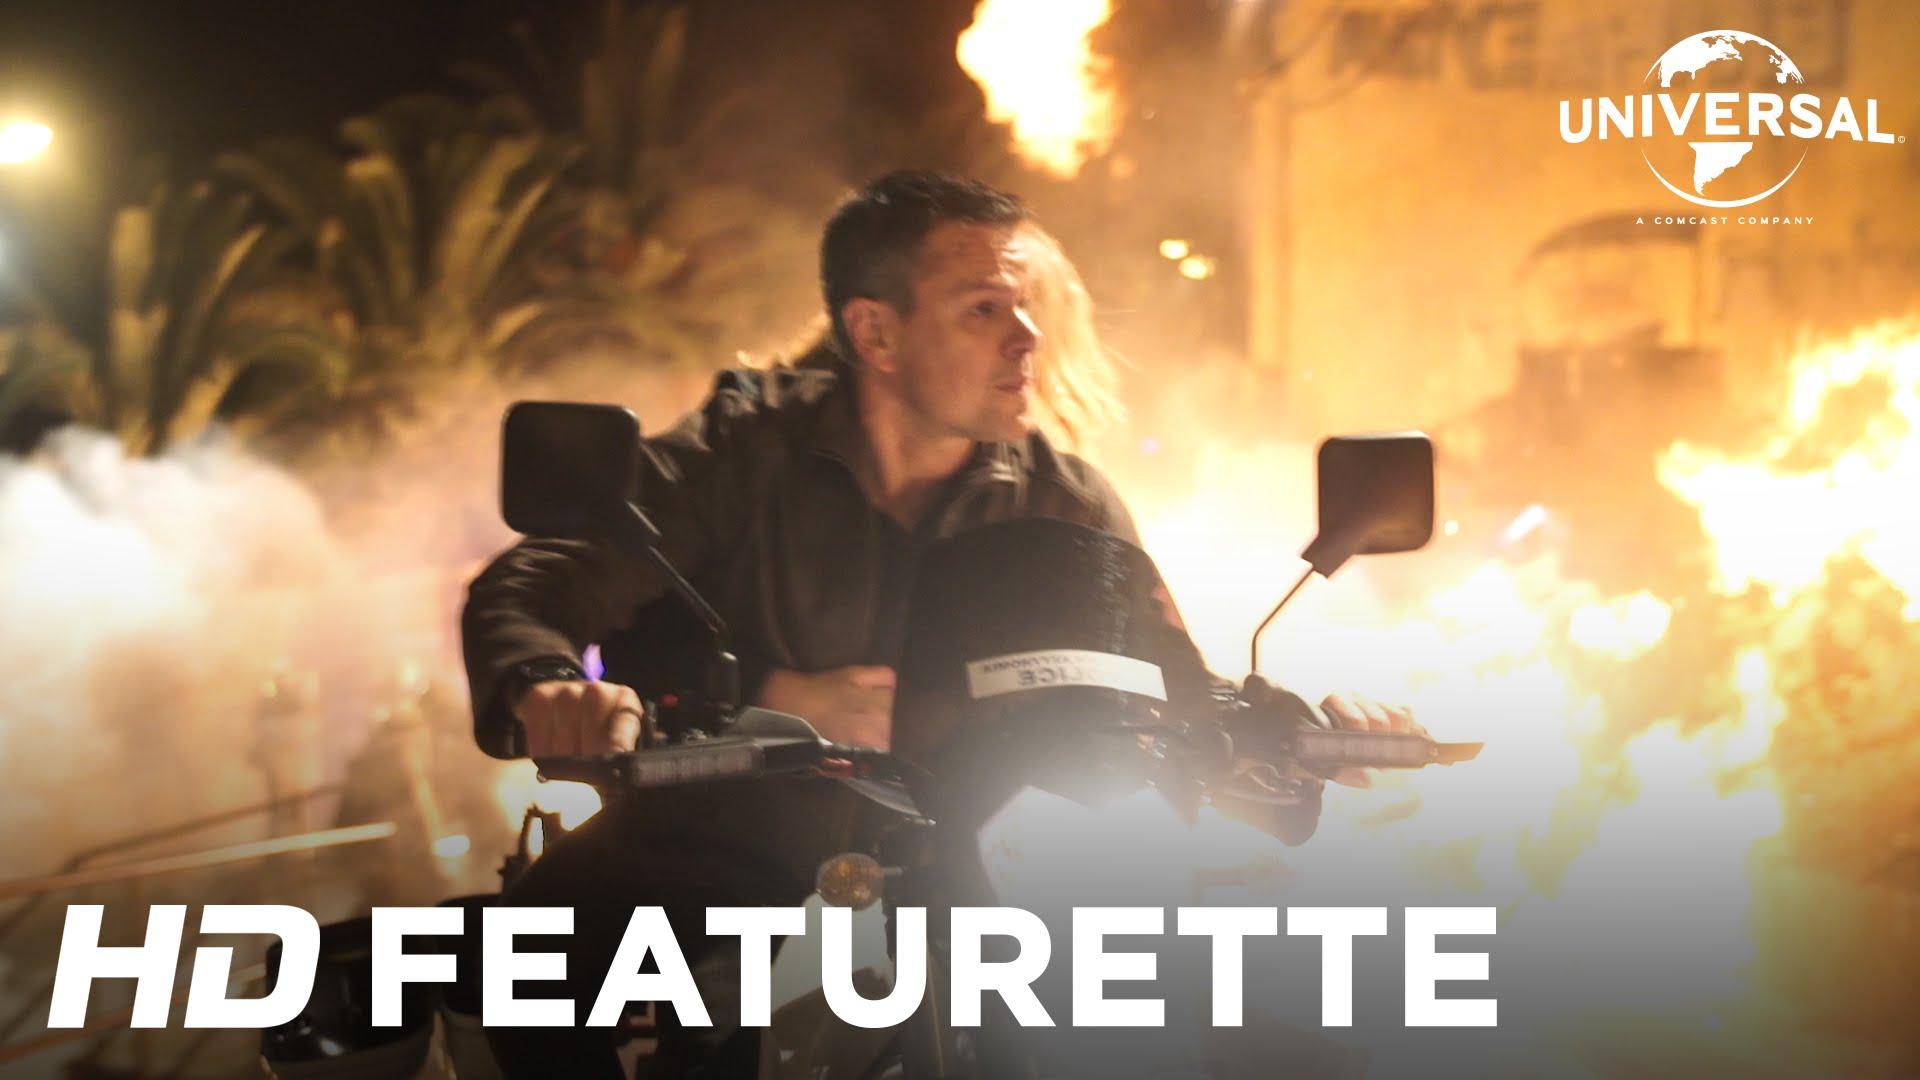 Jason Bourne – Jason Bourne is Back (Universal Pictures)